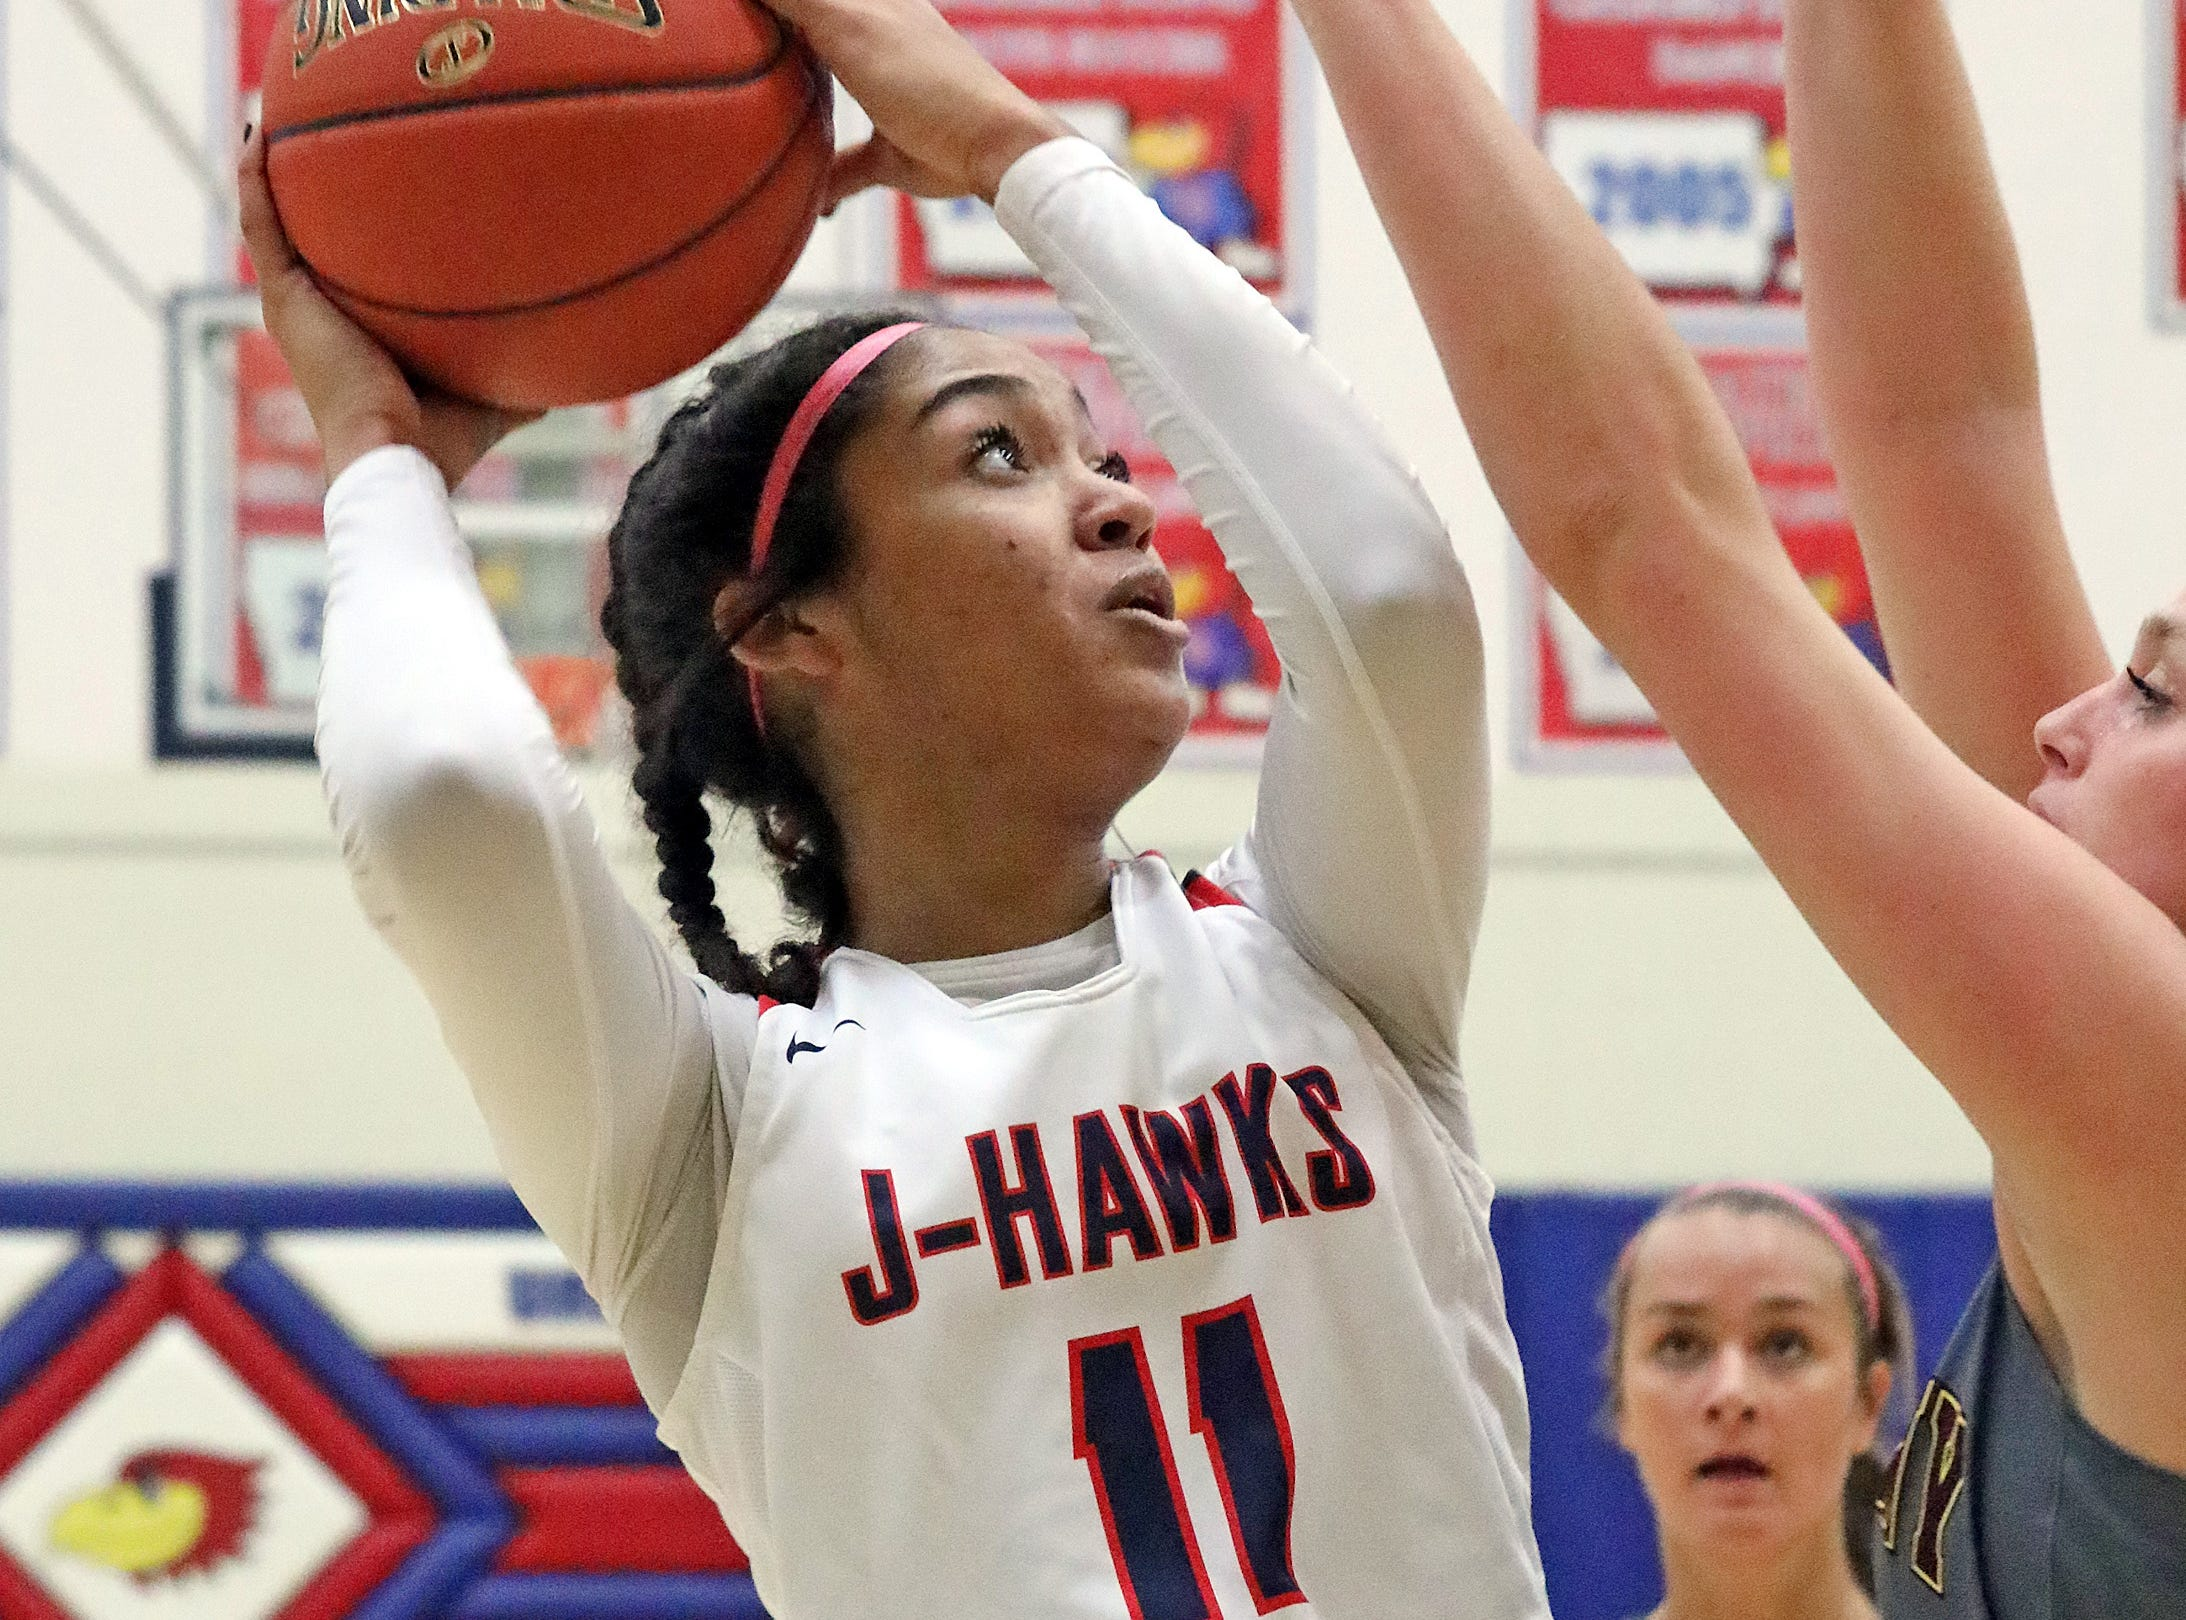 Urbandale junior forward Maya Gyamfi  shoots for two as the Ankeny Hawkettes compete against the Urbandale J-Hawks in high school basketball on Friday, Dec. 14, 2018 at Urbandale High School. Ankeny won 46 to 40.